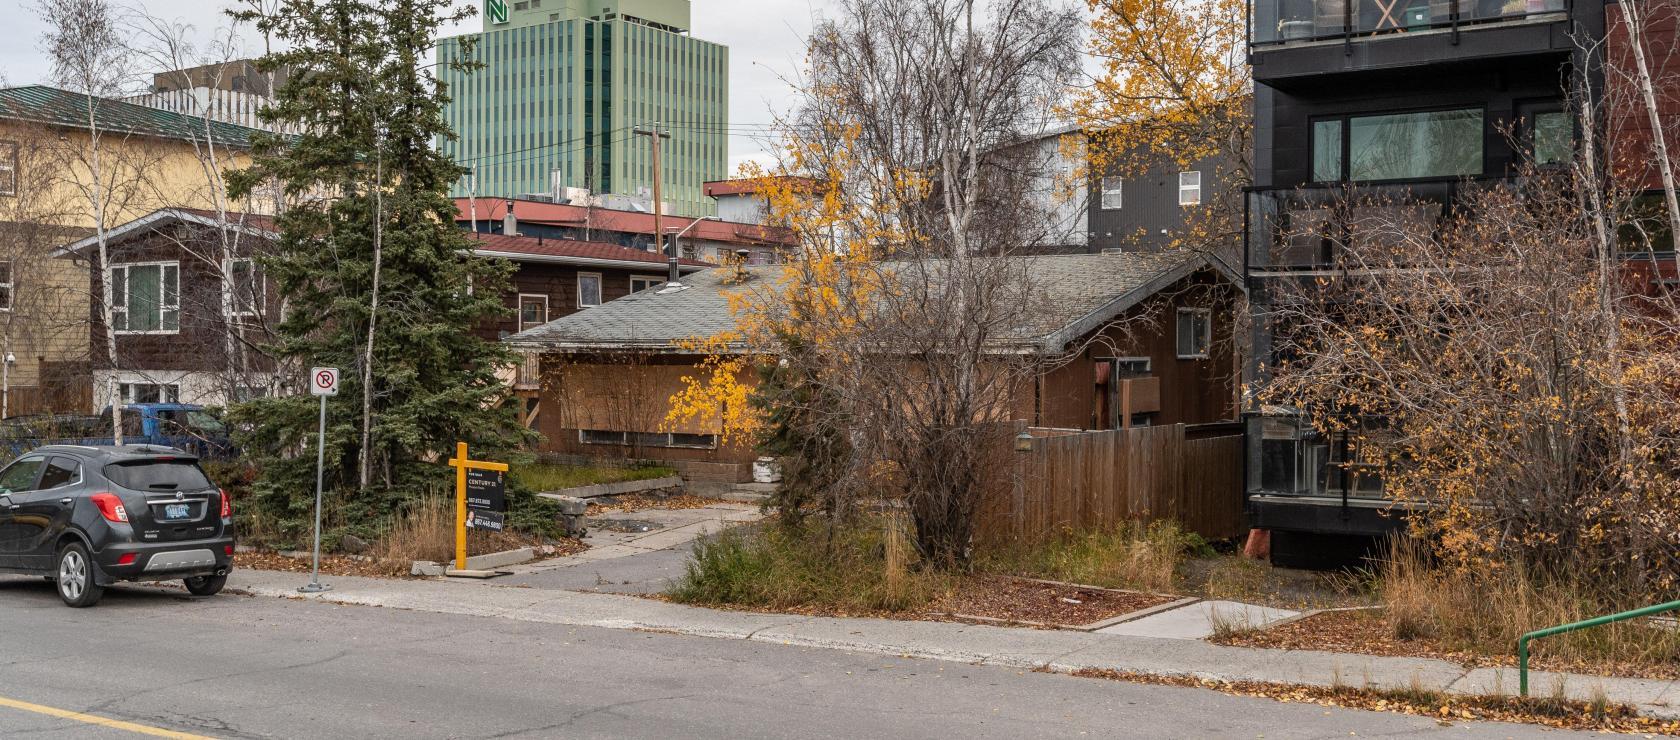 5019 54 Street, Downtown, Yellowknife 2